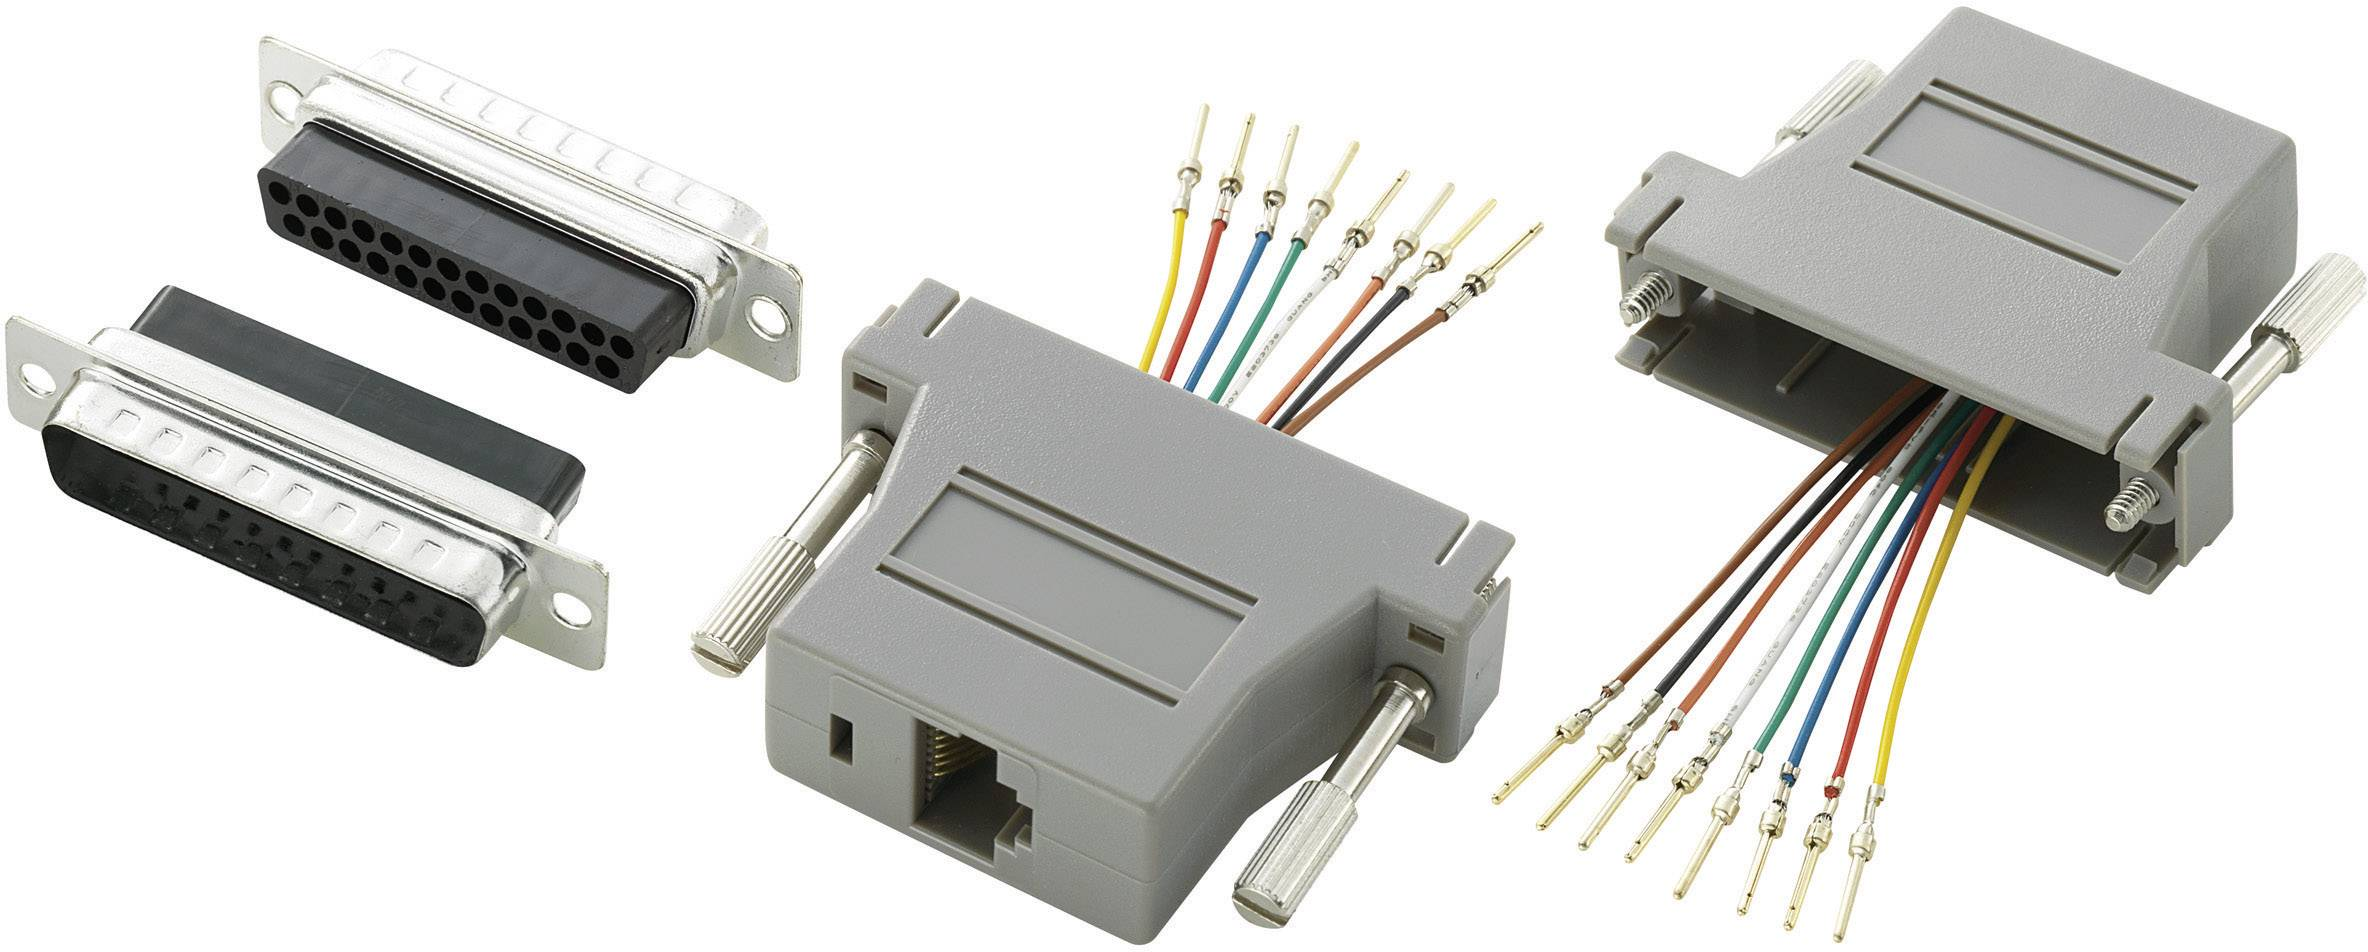 D-SUB adaptér TRU COMPONENTS 407783 D-SUB zástrčka 25pólová - RJ45 zásuvka, 1 ks